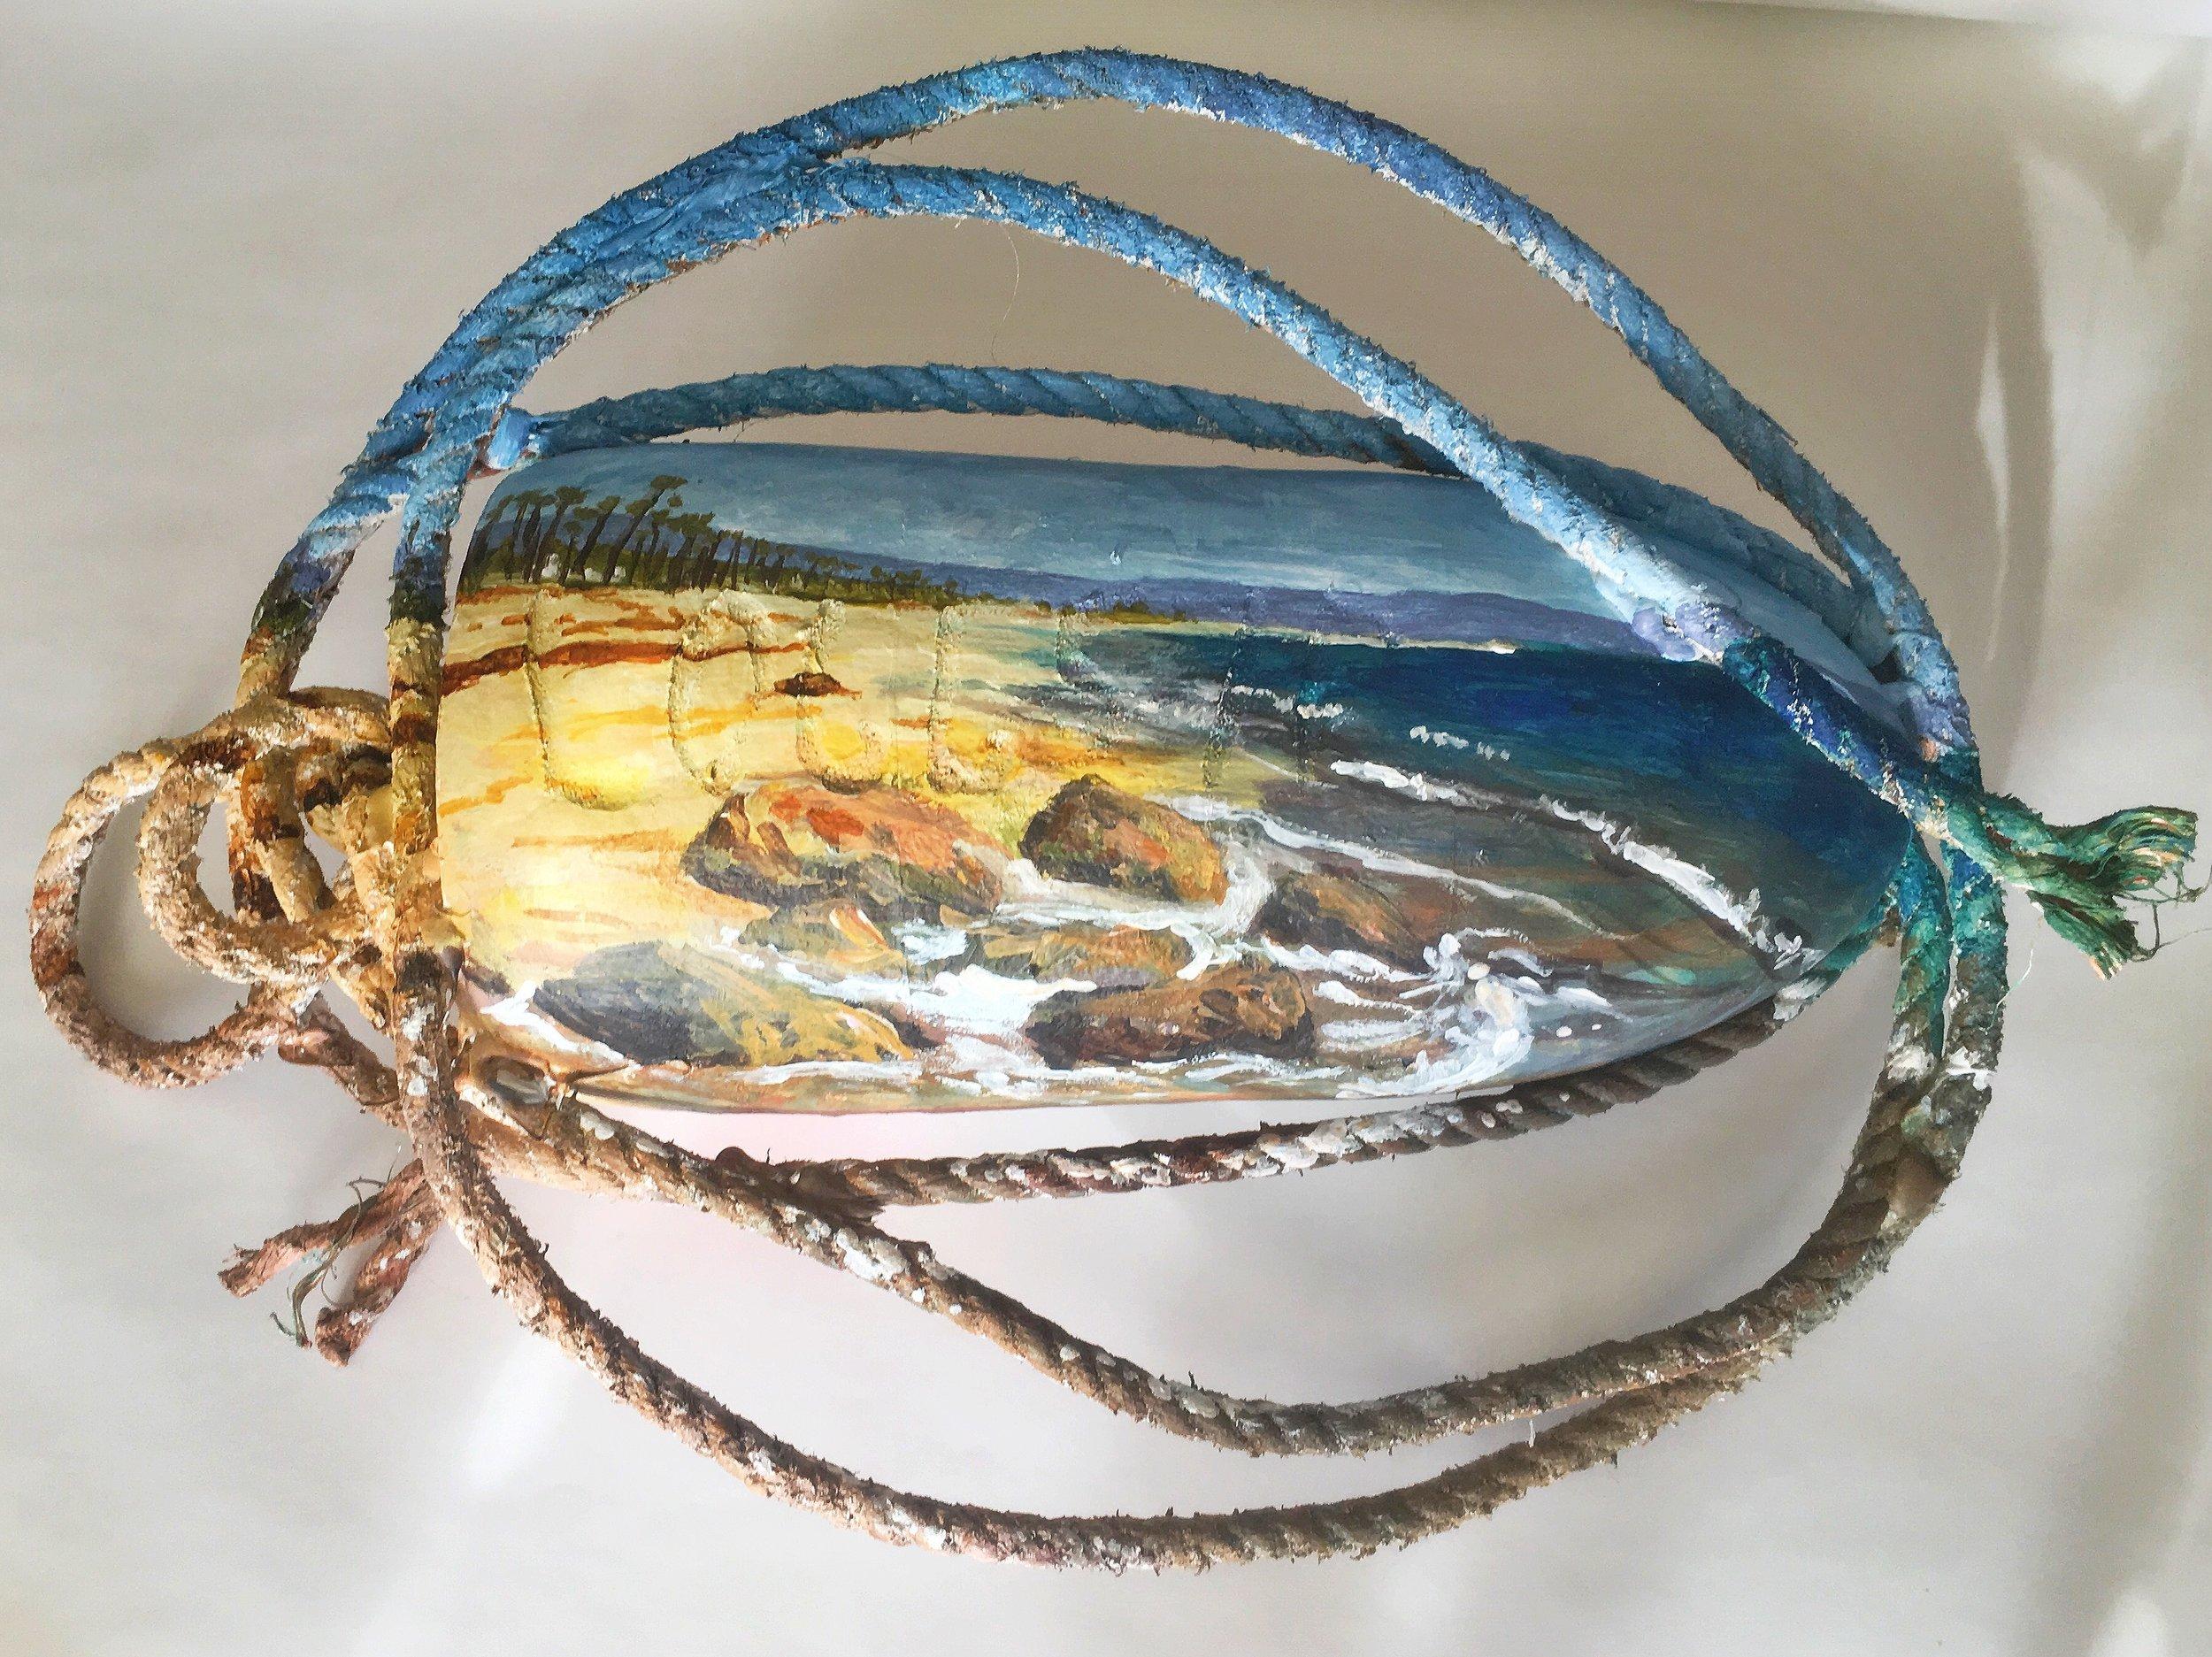 Acrylic on buoy found at East Beach, Santa Barbara